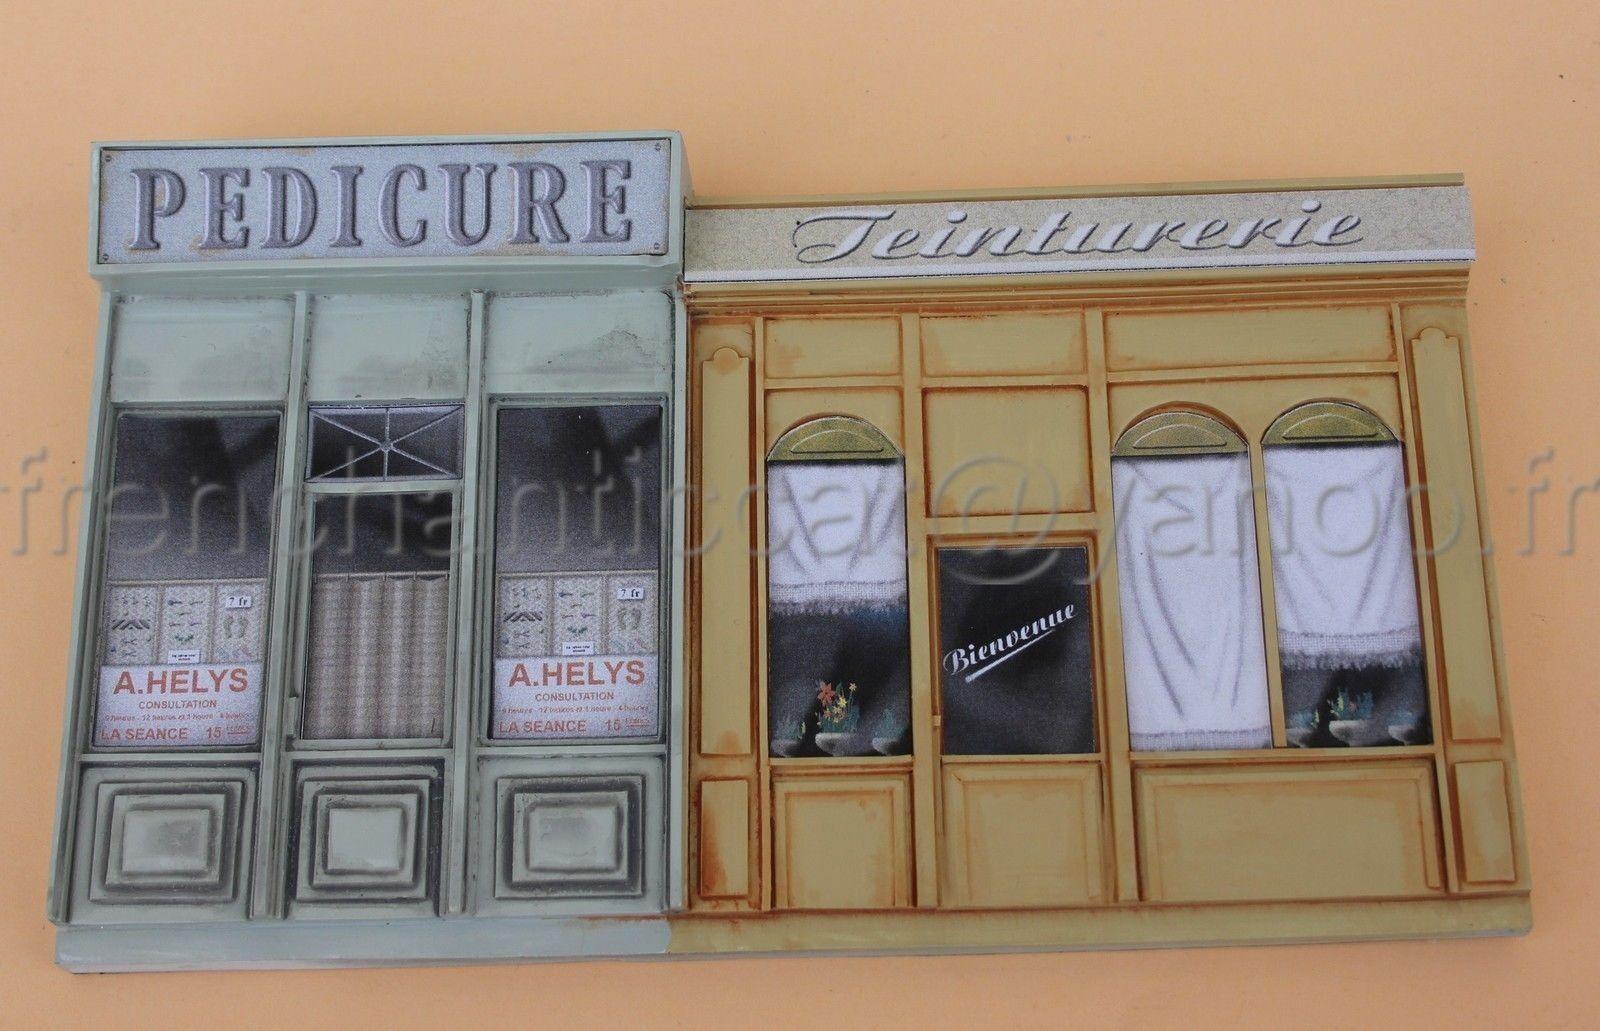 Idea Fachada Complete 1 43 Heco Miniaturas Shop Diorama Fondo Resina Teinturie